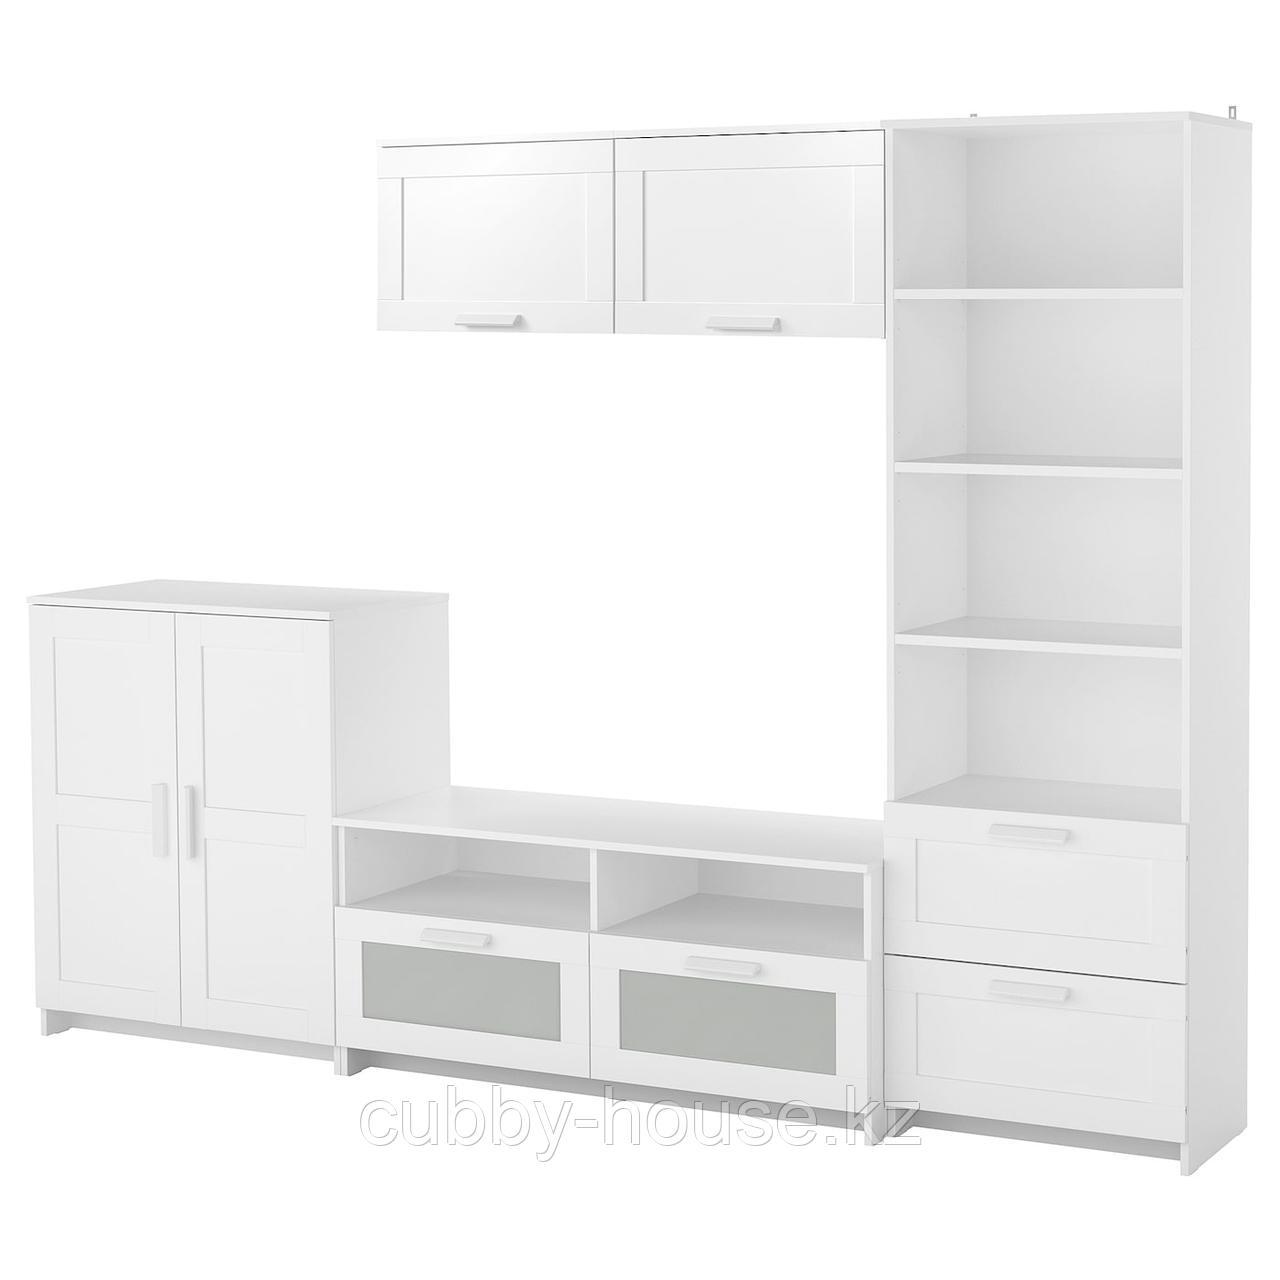 БРИМНЭС Шкаф для ТВ, комбинация, (белый, чёрный) 258x41x190 см